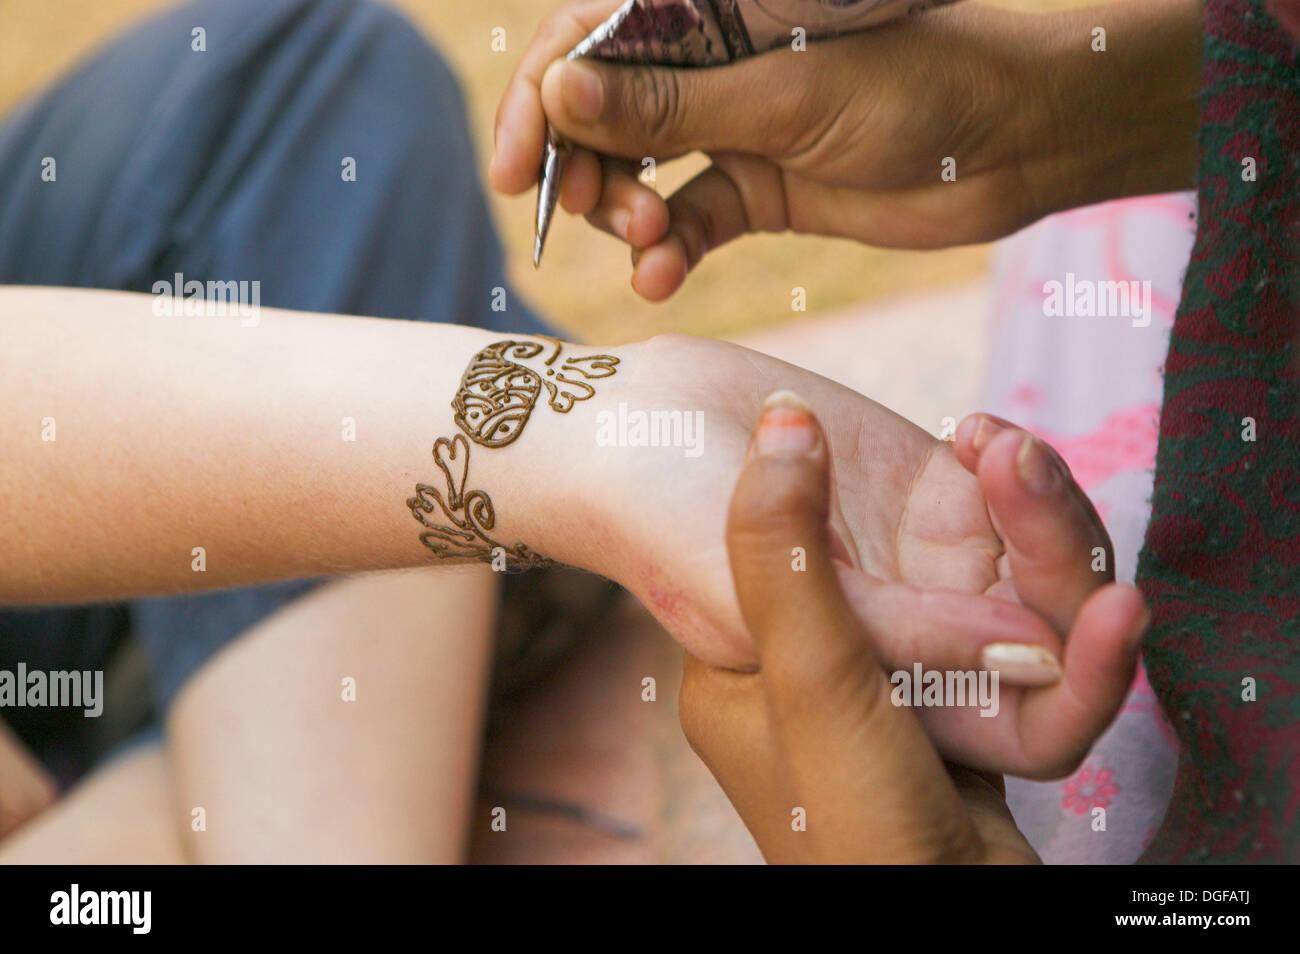 Tattoo Print Stock Photos & Tattoo Print Stock Images - Page 2 - Alamy